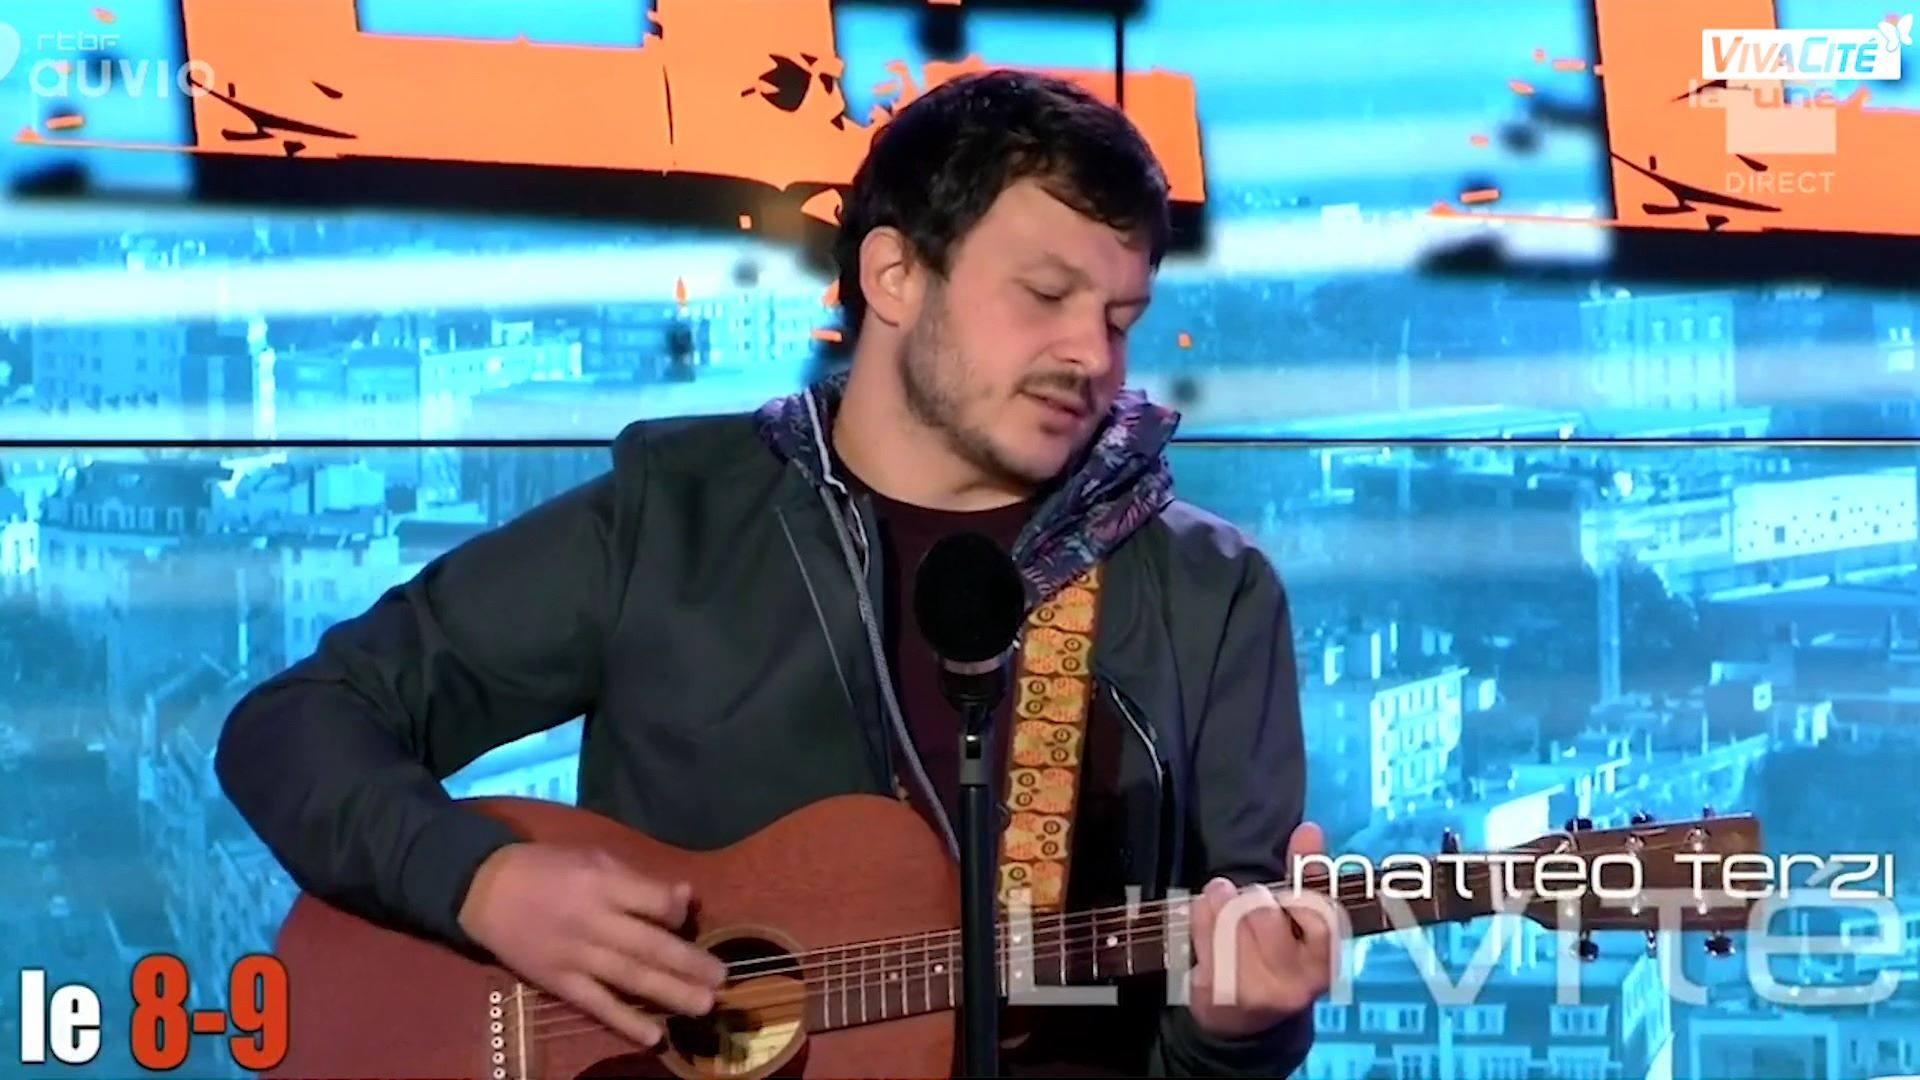 L'instant live du 8/9 :: Matteo Terzi